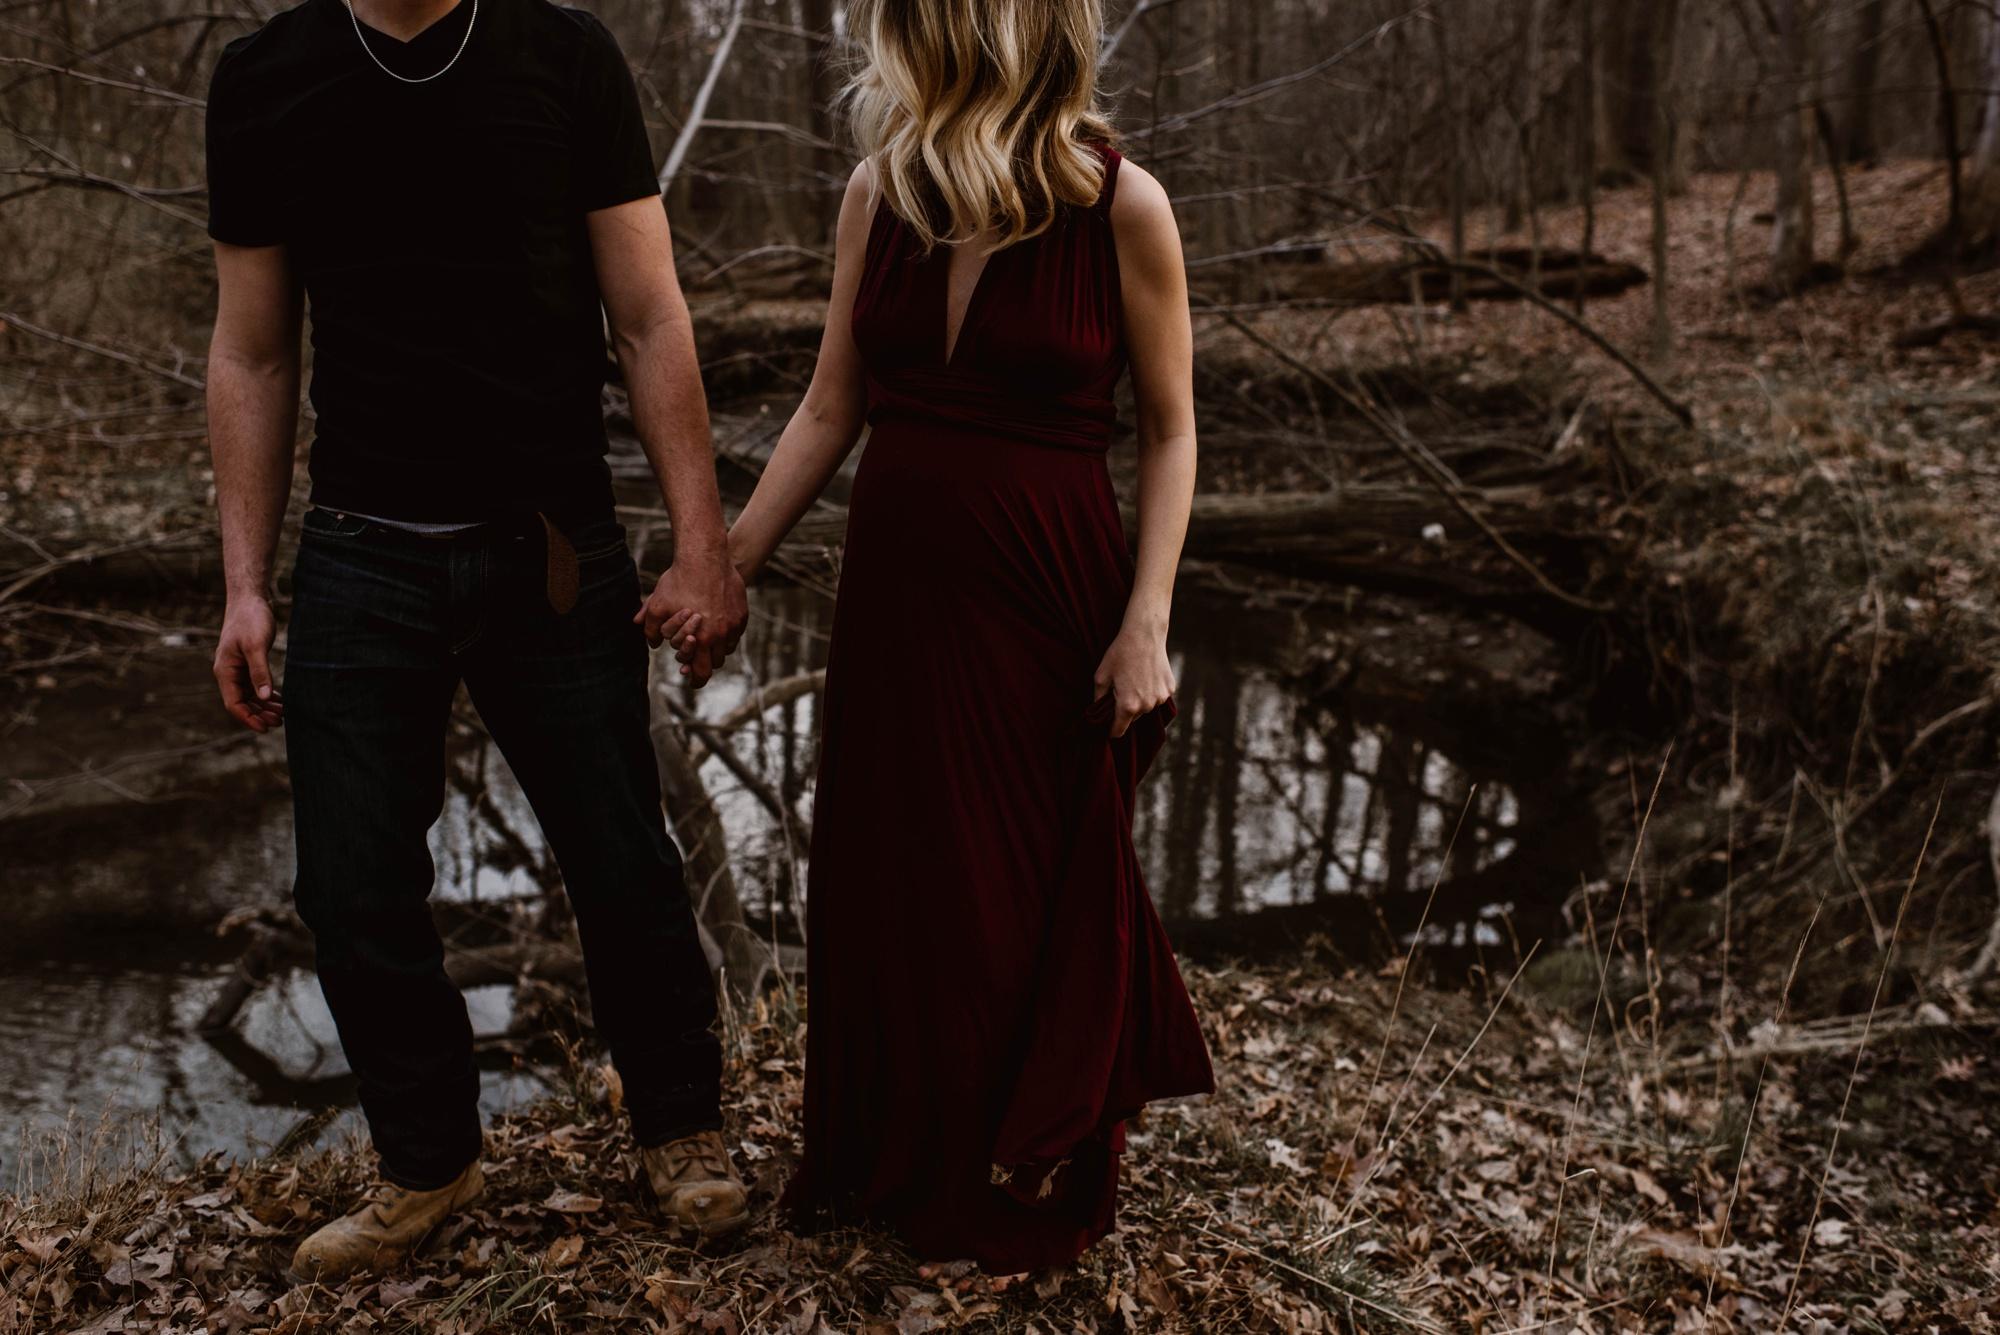 maternity-danielle-b-lauren-grayson-cleveland-akron-canton-ohio-photographer-family-maternity-photography-session-photos-_0038.jpg